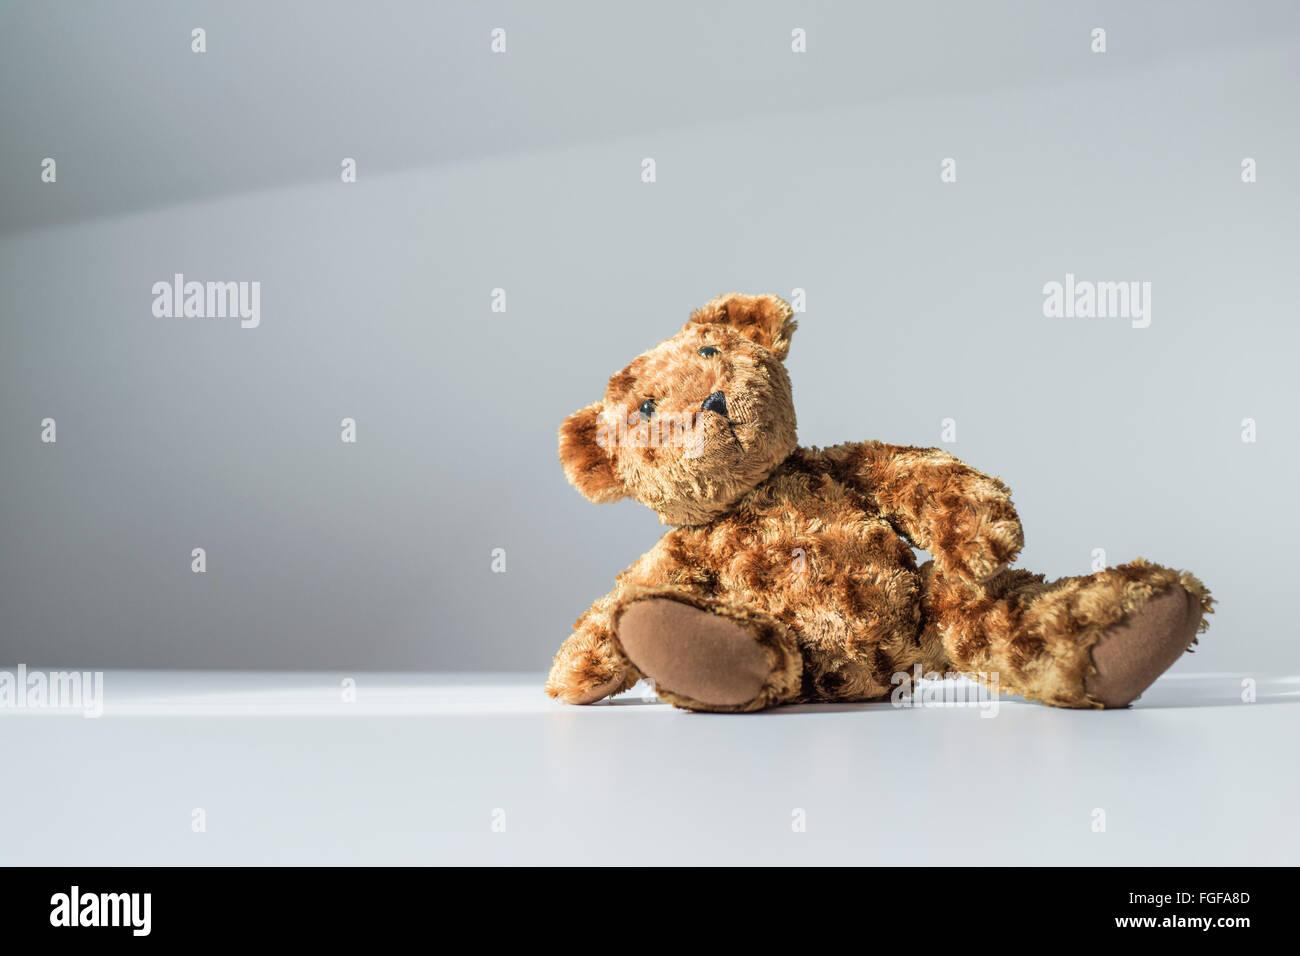 Teddy Bear Stockfotos & Teddy Bear Bilder - Alamy